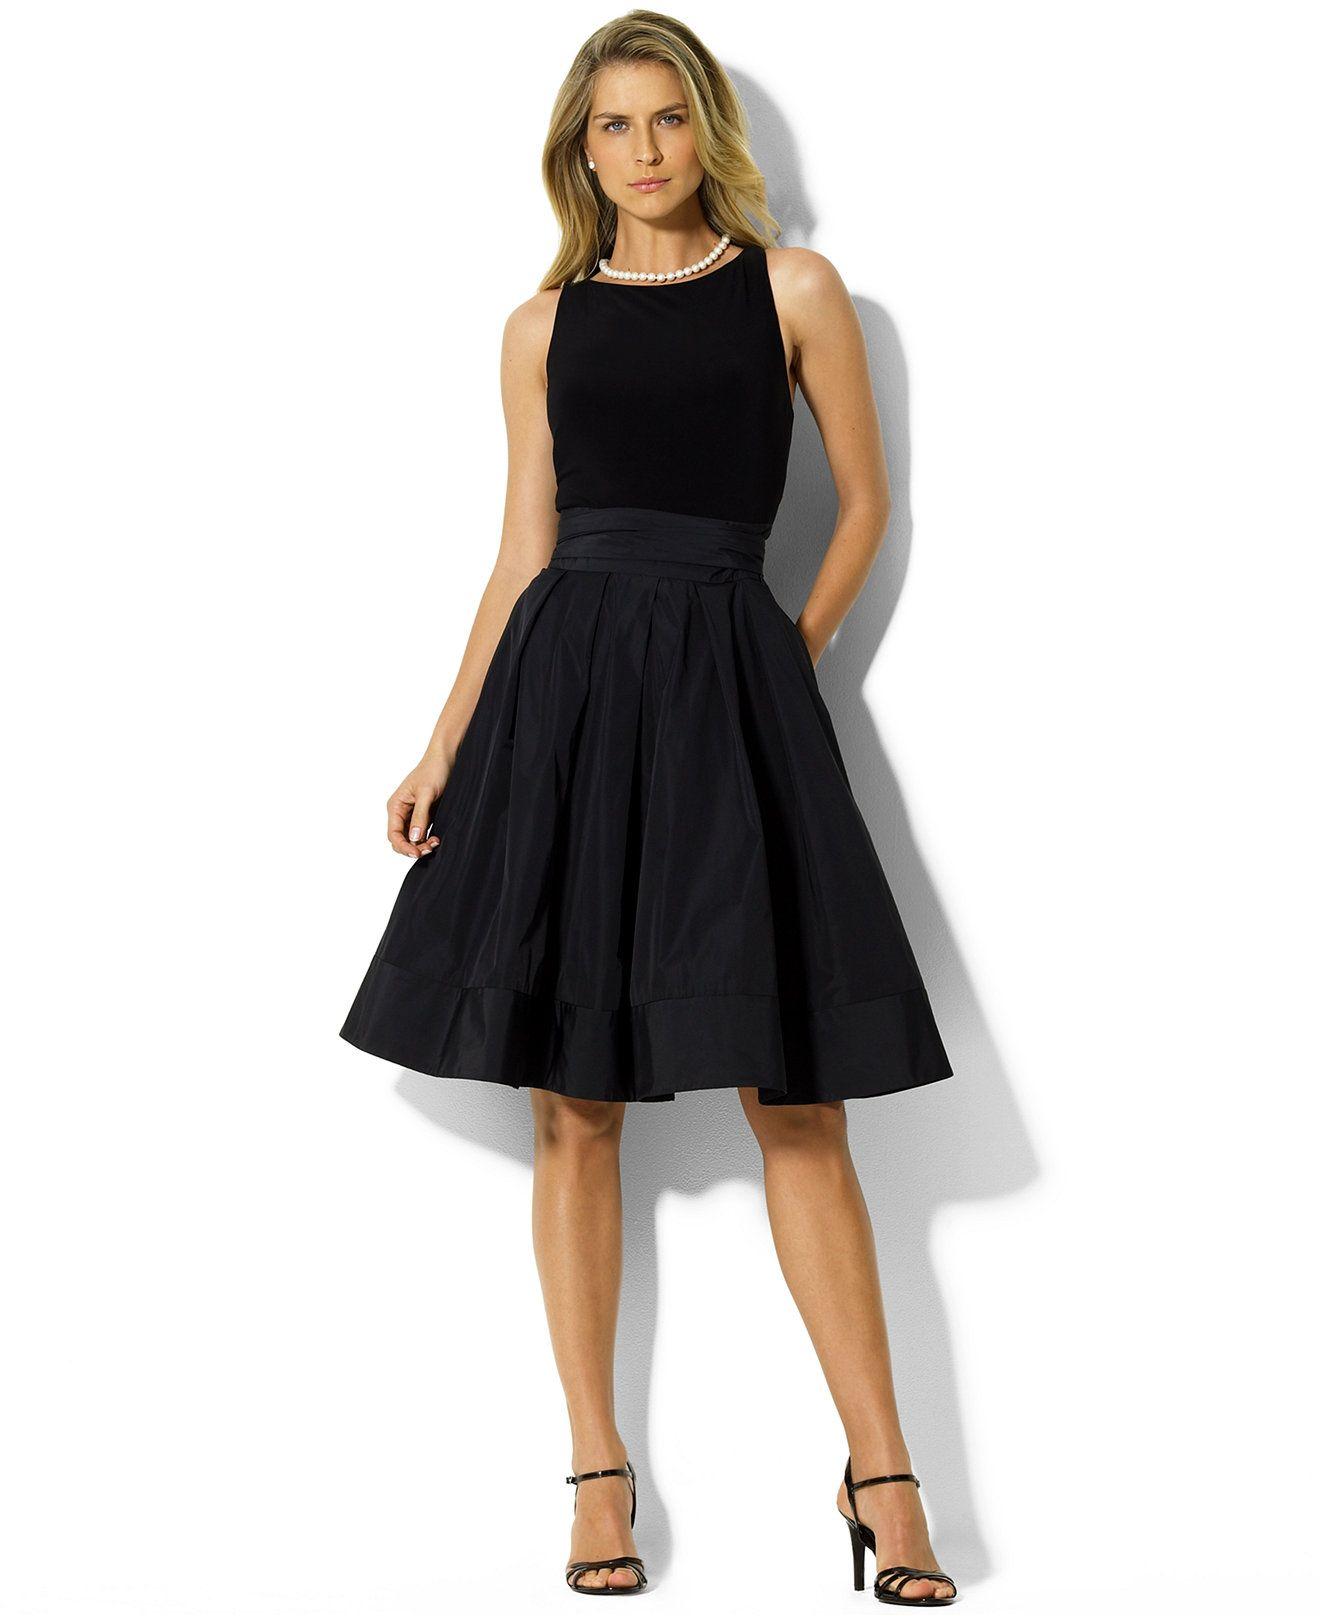 177c93ac Lauren Ralph Lauren Pleated Cocktail Dress - Dresses - Women ...